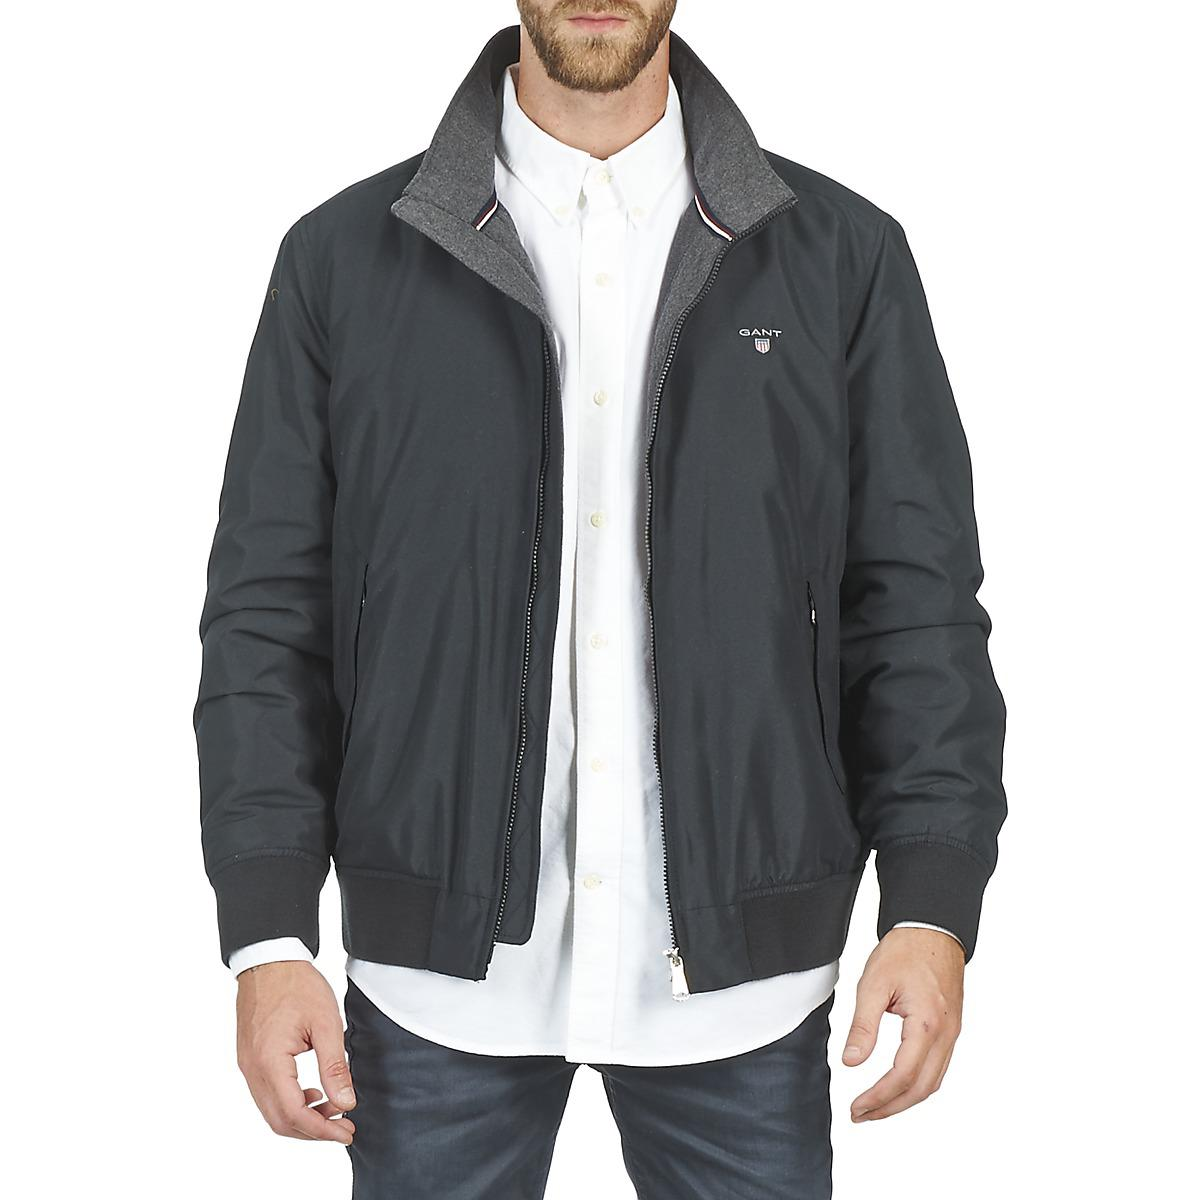 c10b794203 The in Gant Lyst Hampshire Men for Jacket Black Jacket dzqCSU